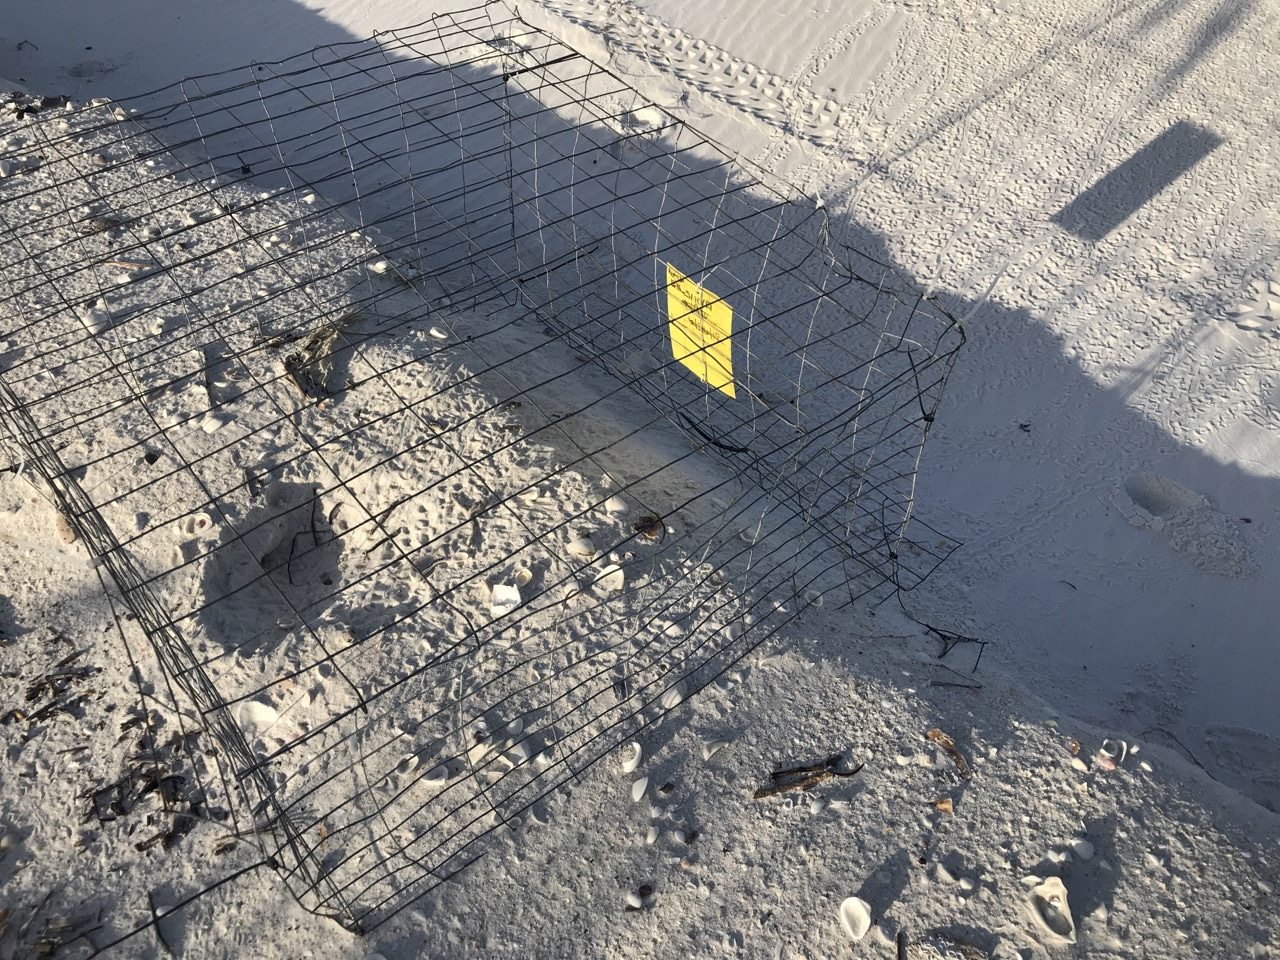 Sea turtle nesting cage atop beach erosion